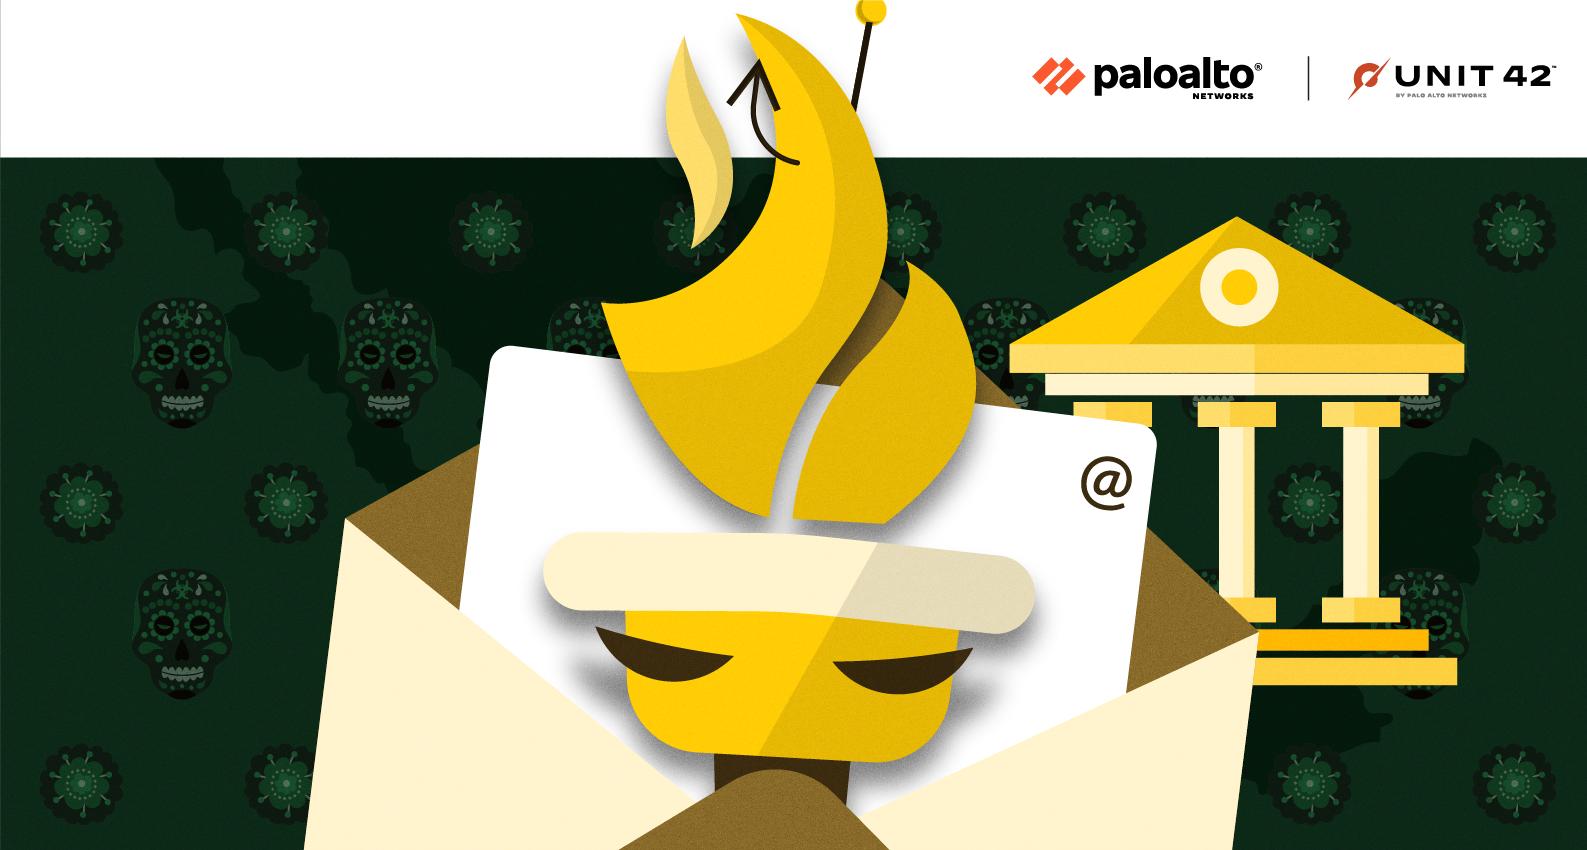 A conceptual image representing Prometheus ransomware